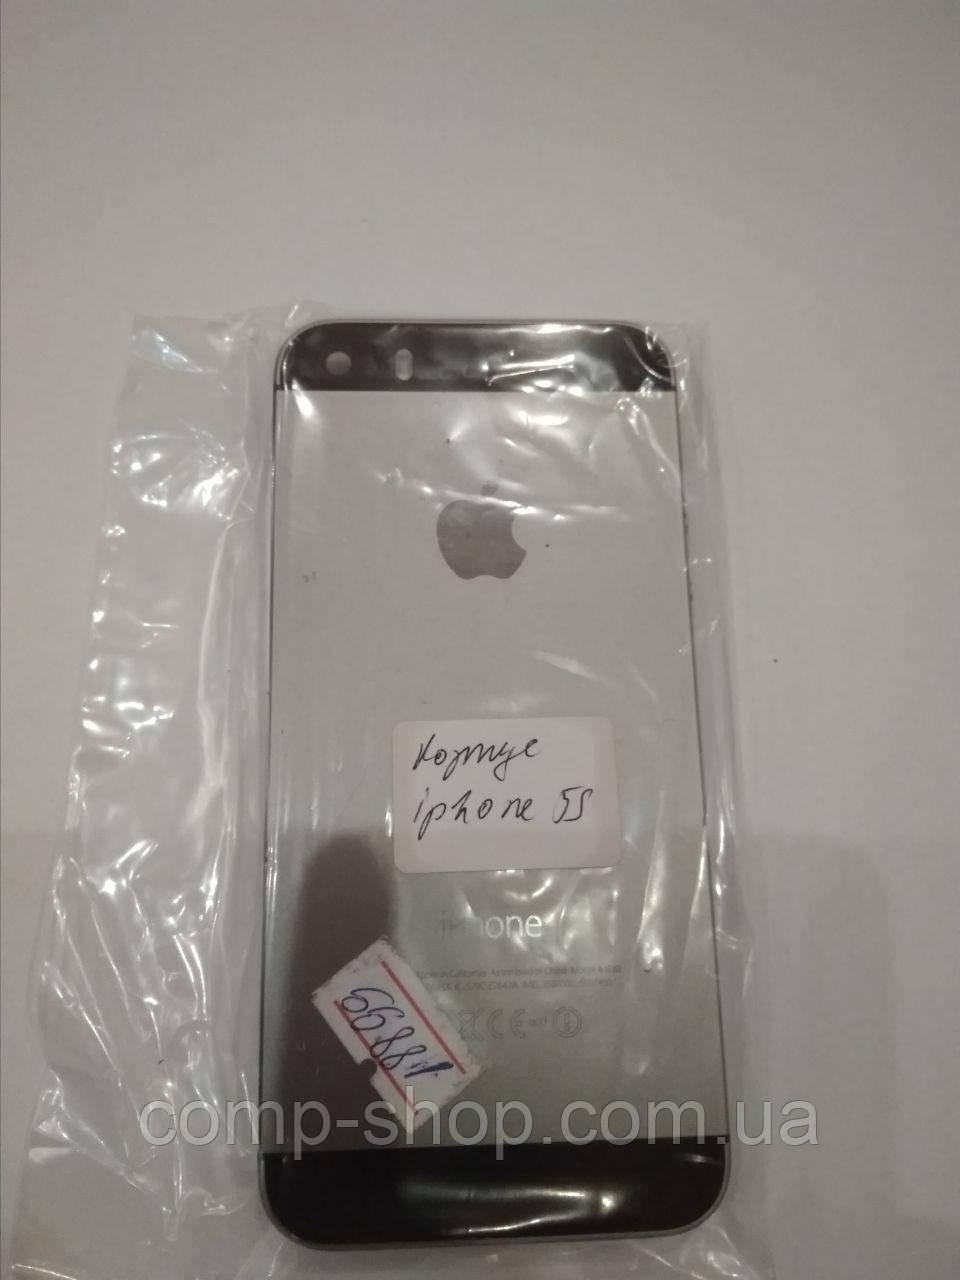 Корпус iPhone 5s оригинал бу, запчасть с разборки